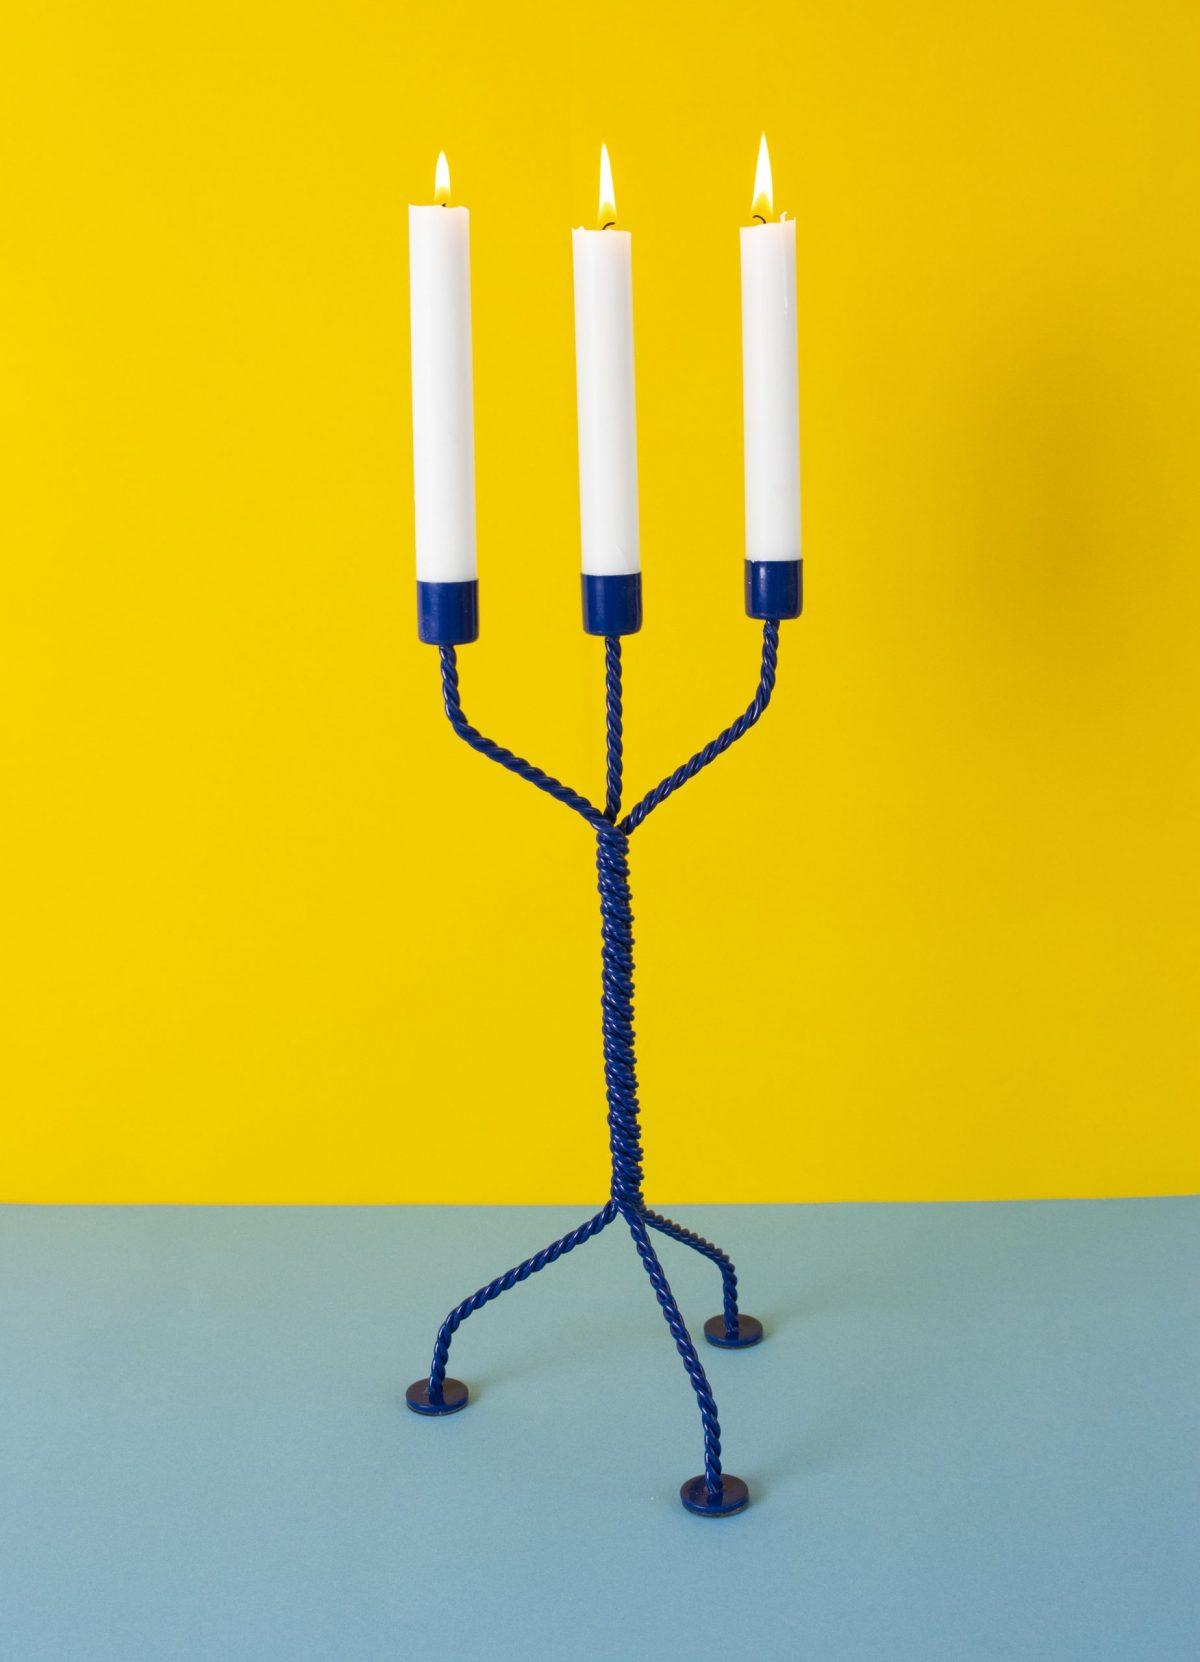 Werkwaardig Twisted Candleholder Dutch Design Kleuren Blauwgeel